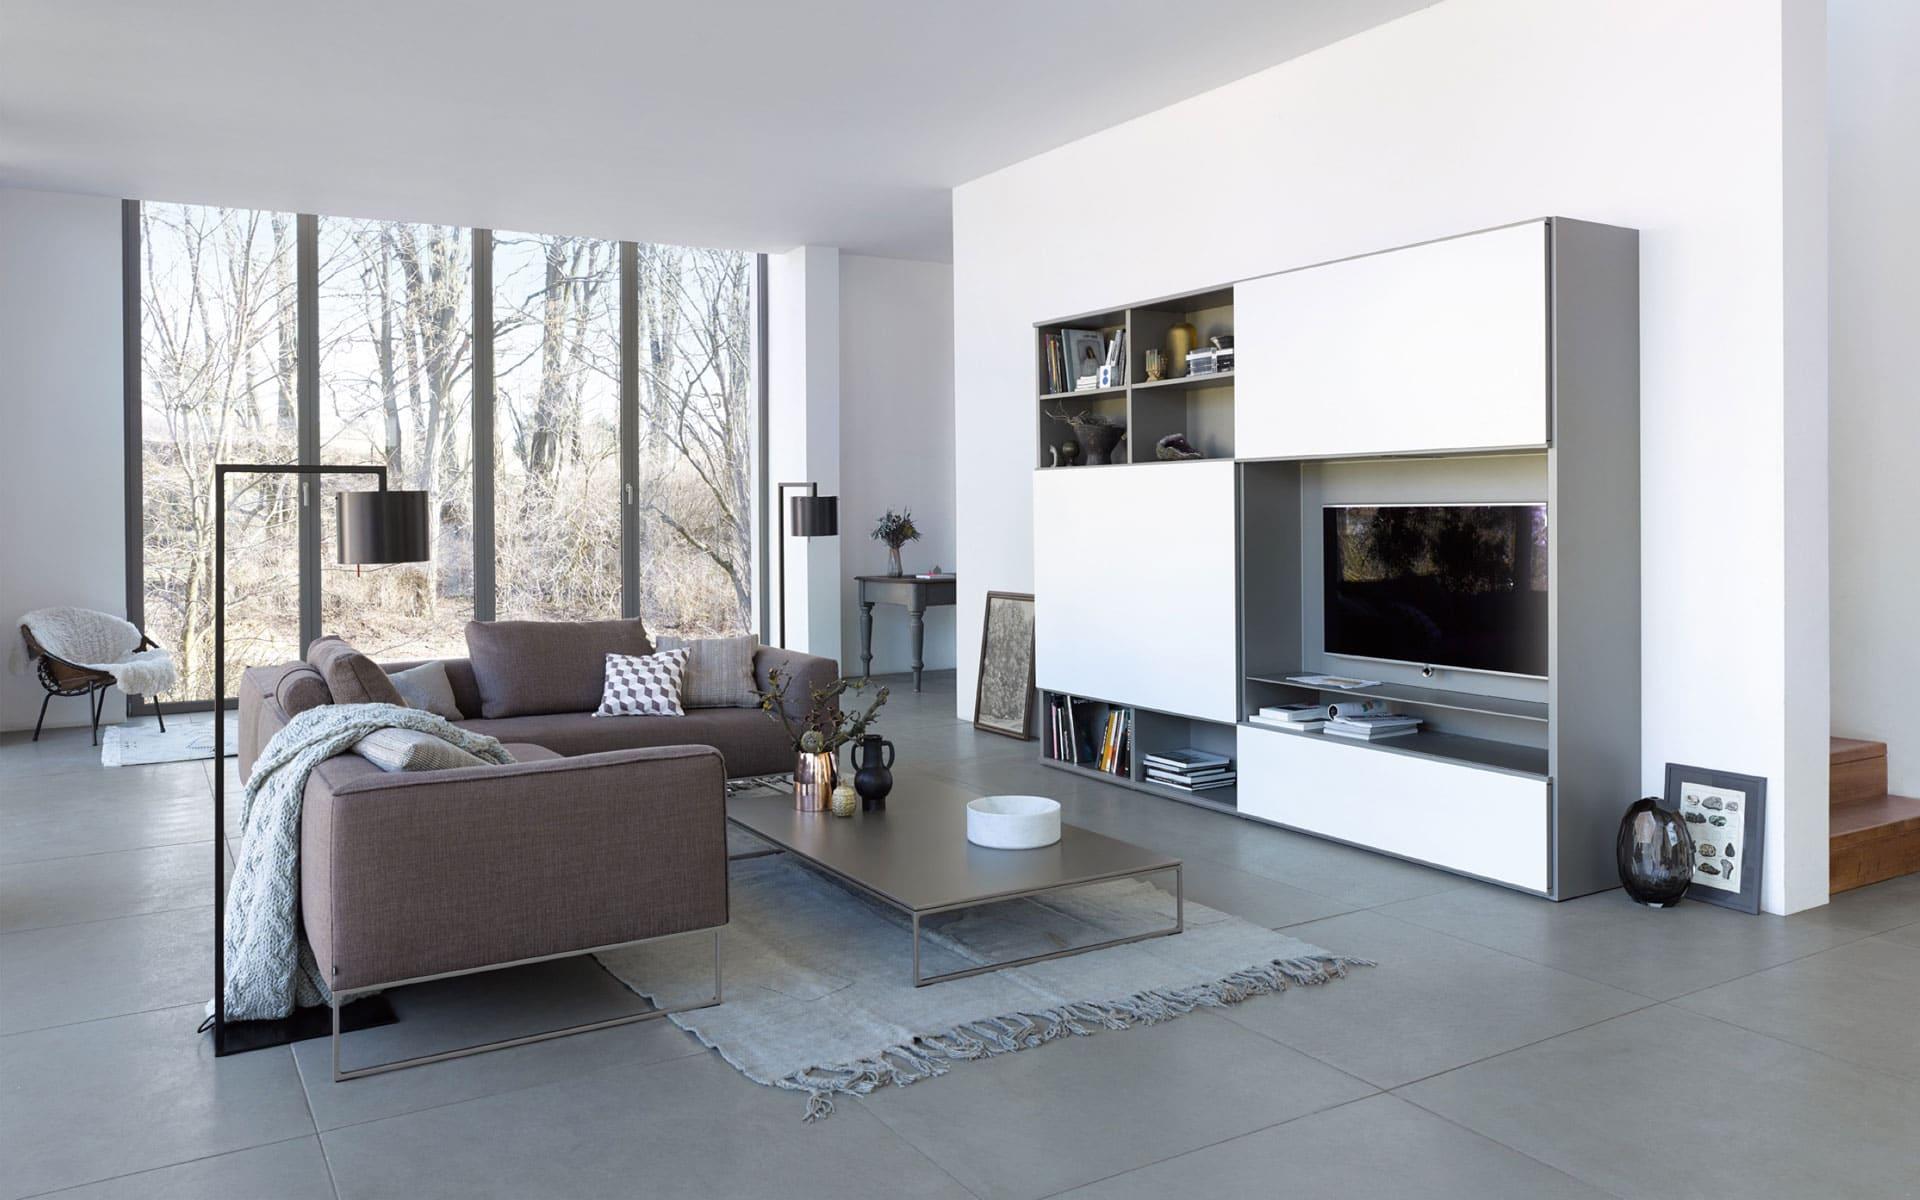 mell lounge sofa cor. Black Bedroom Furniture Sets. Home Design Ideas